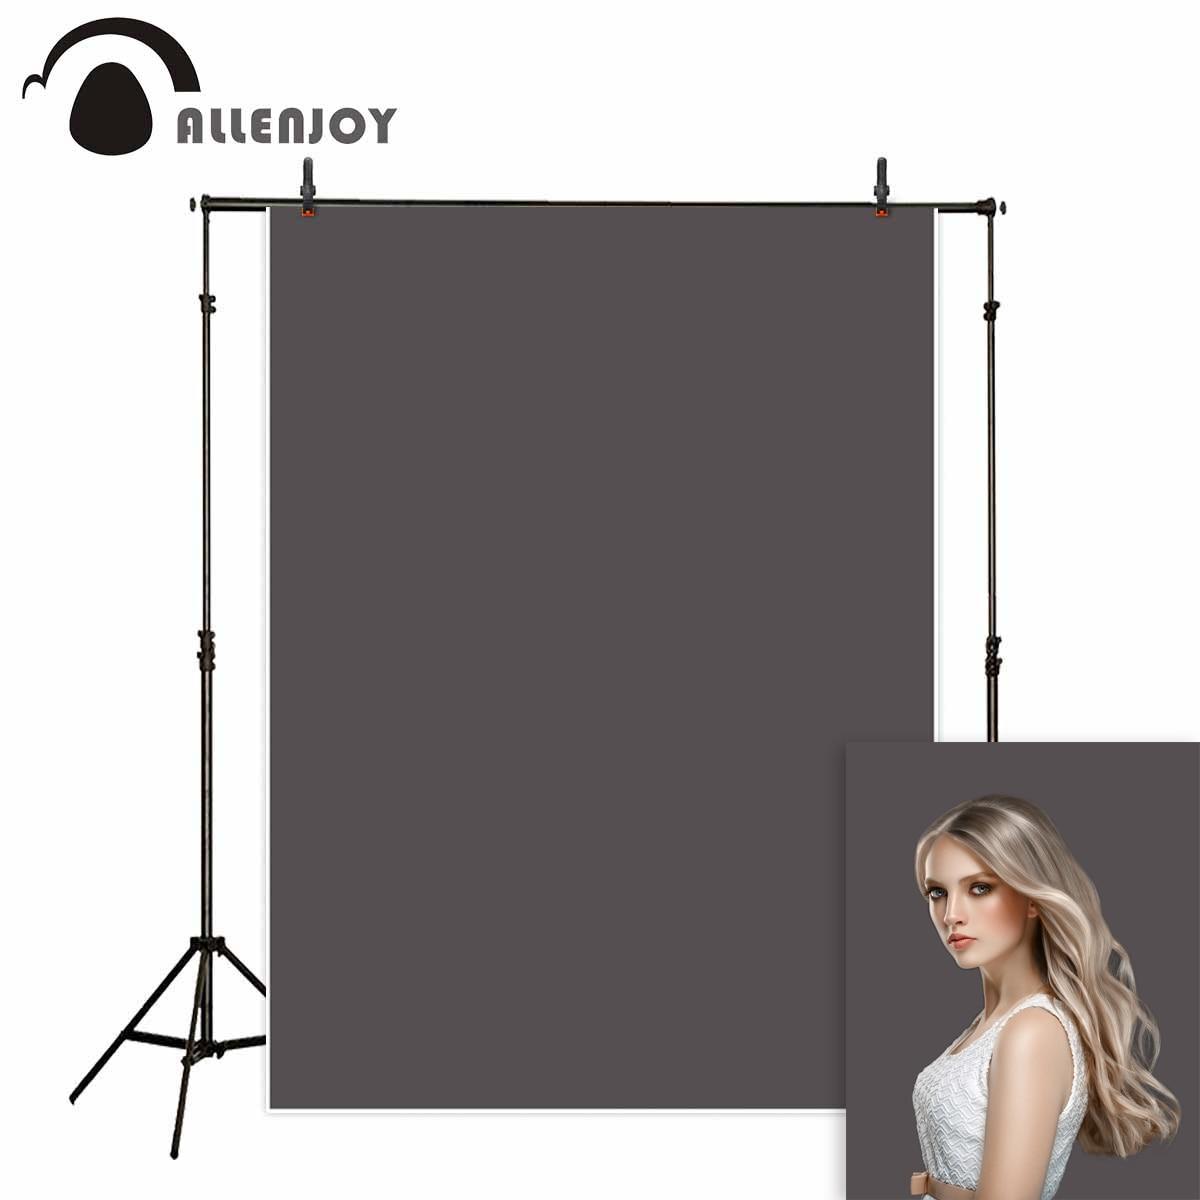 Allenjoy gris color sólido fotografía telón de fondo bebé photophone estudio Fondo retrato sesión fotográfica boda